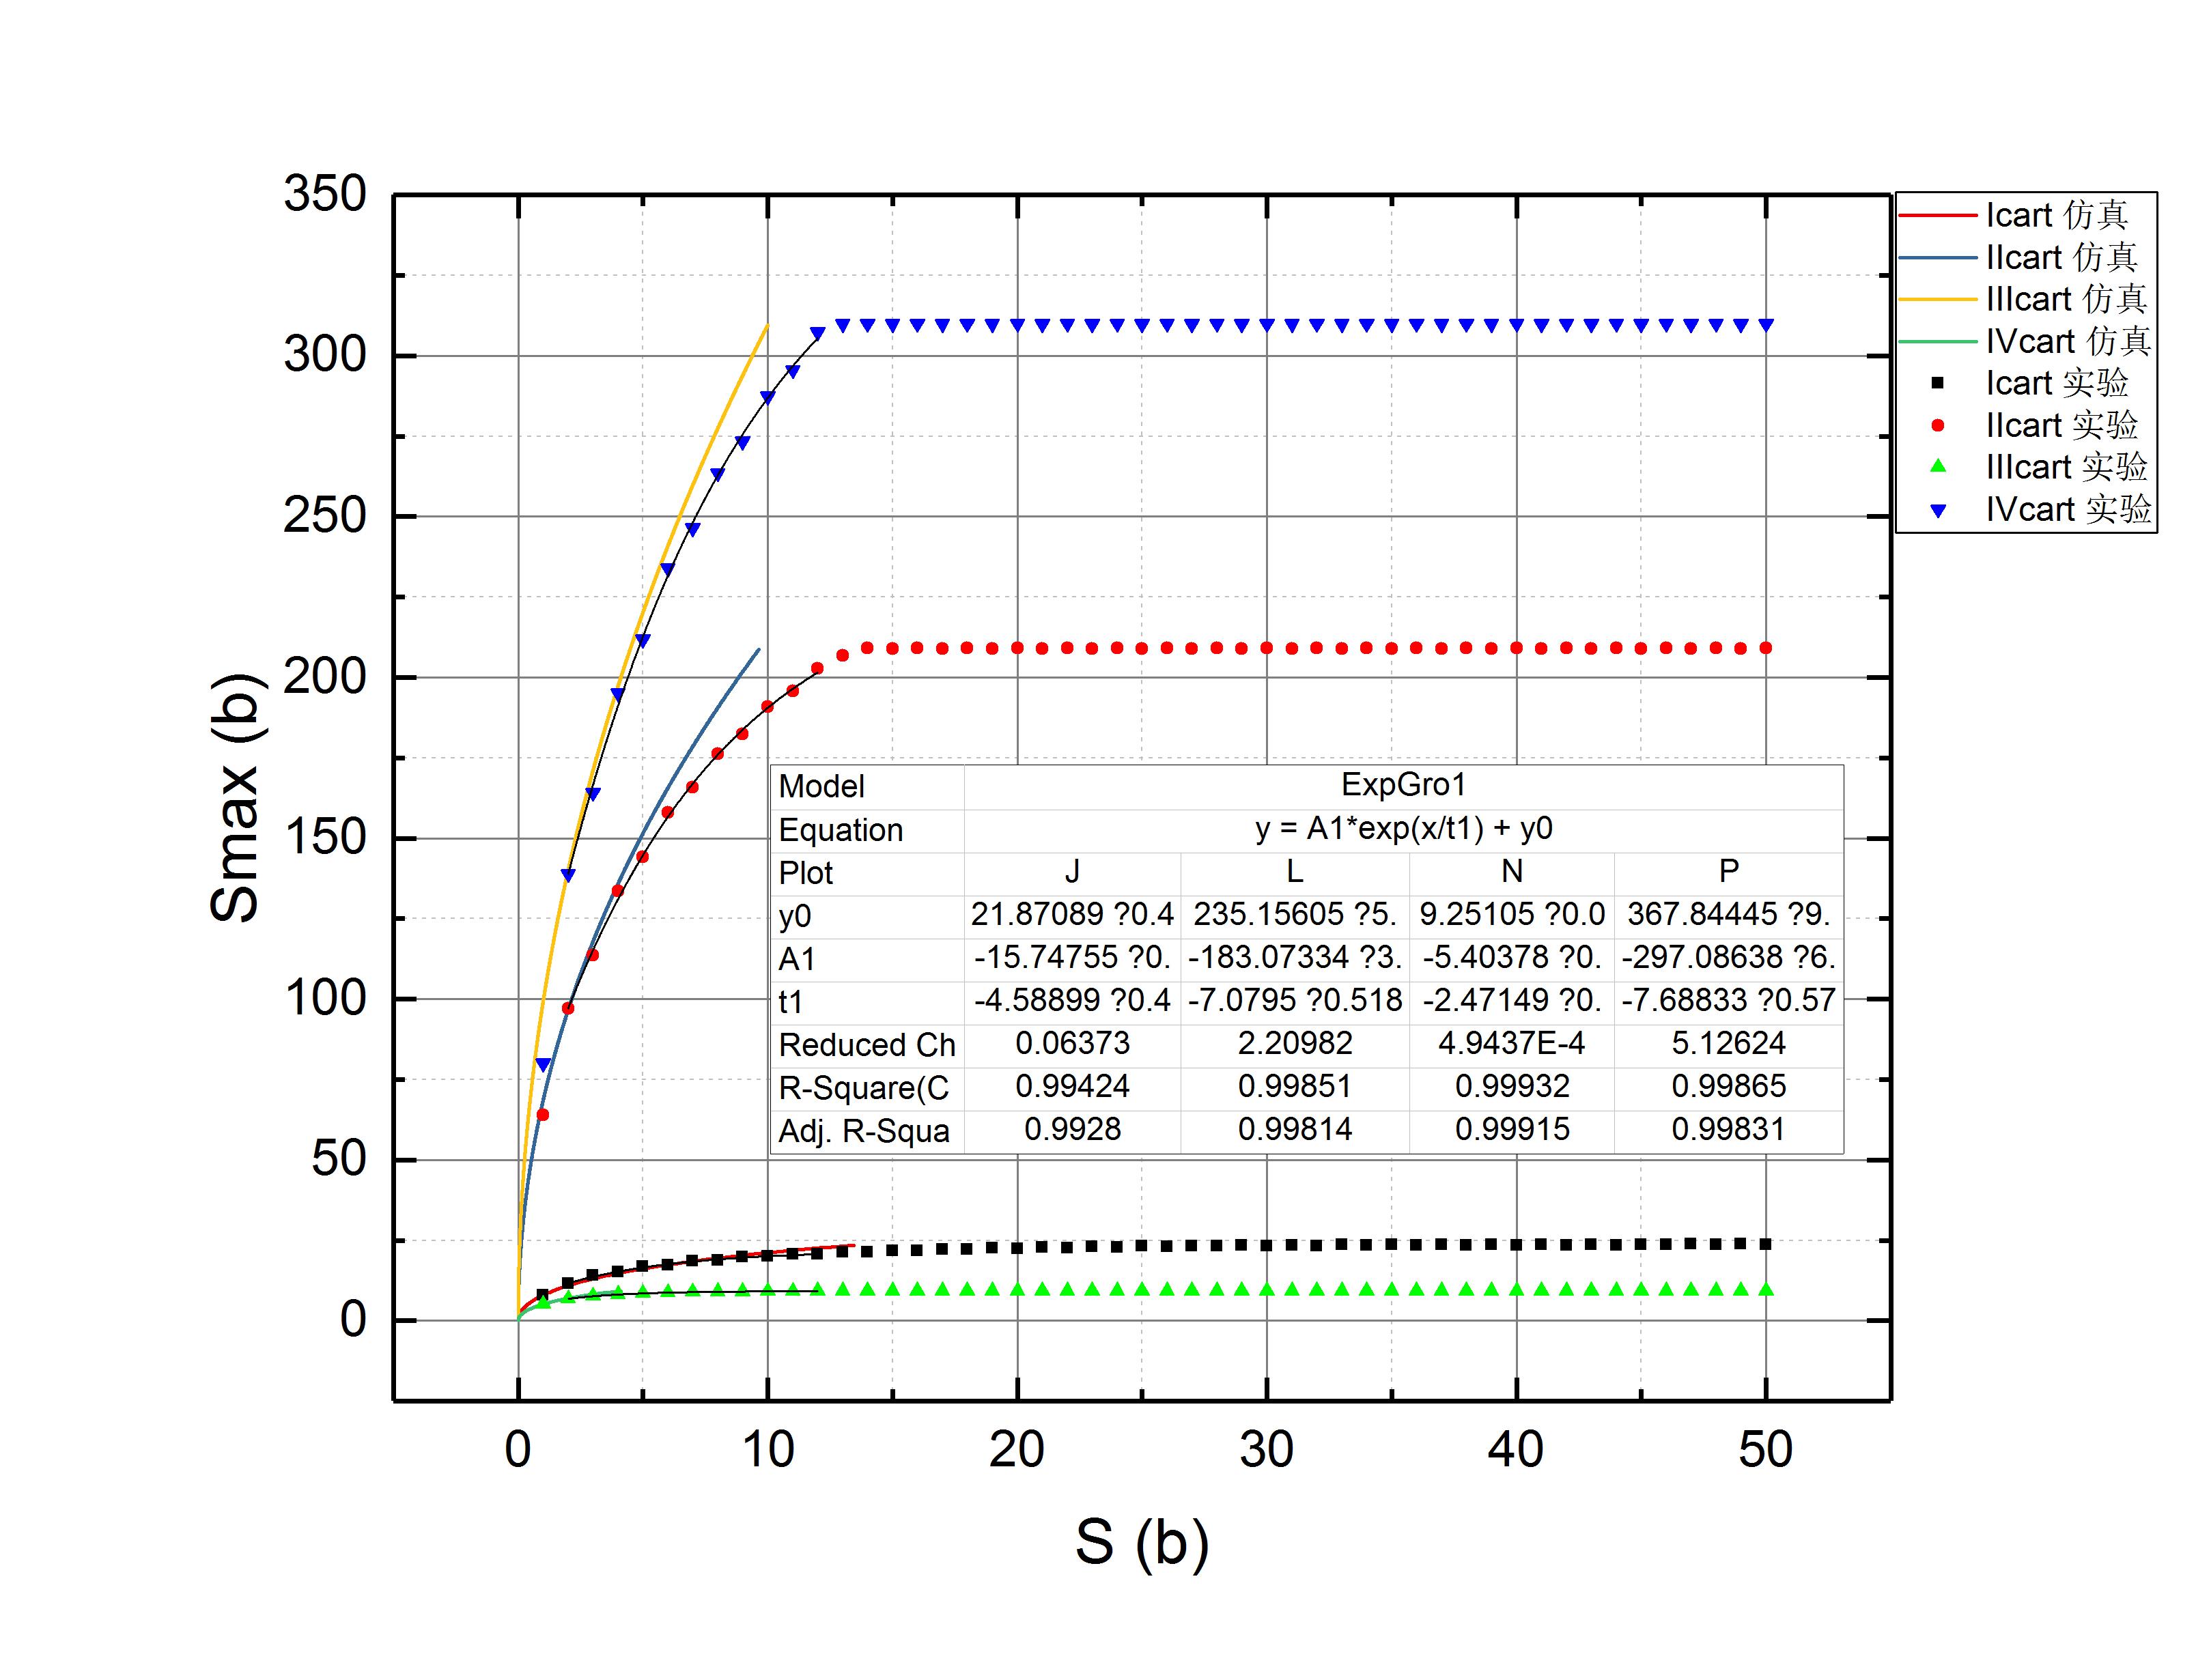 C:UsersTRDesktopS-Smax¶Ô±È.opj/S-Smax¶Ô±È/Folder1//Graph1